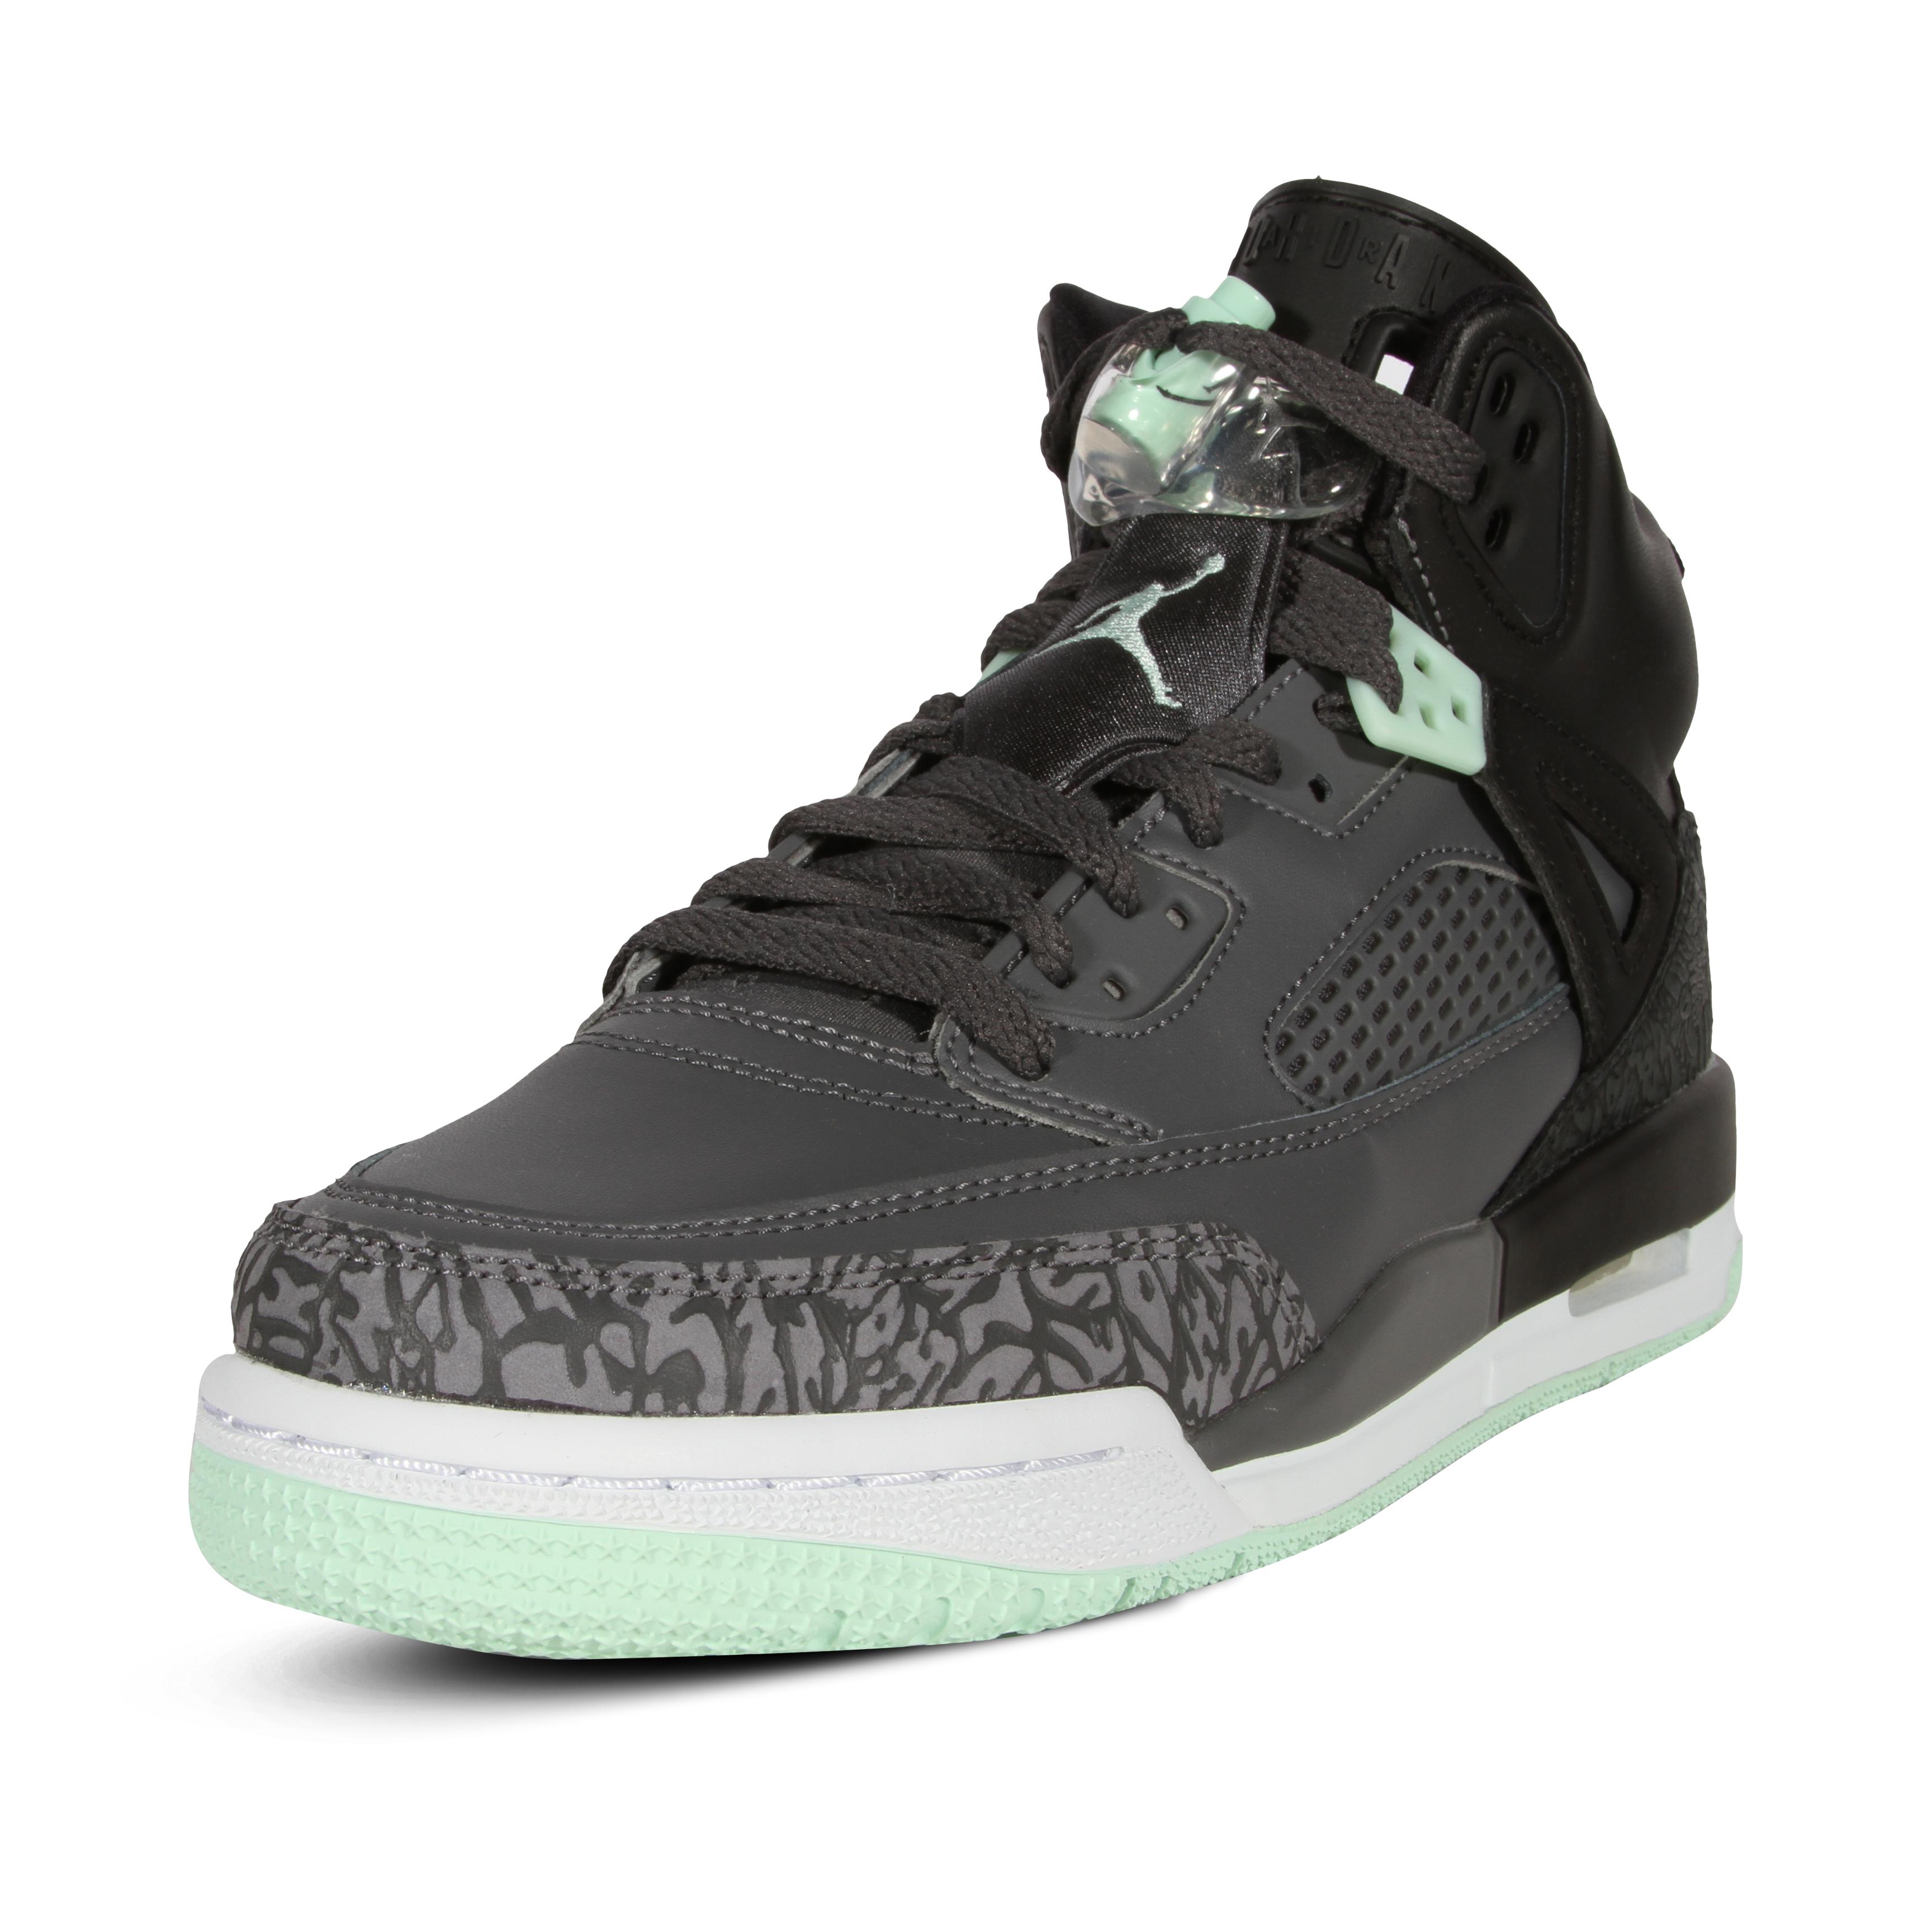 shoes for women jordan spiz ike nz